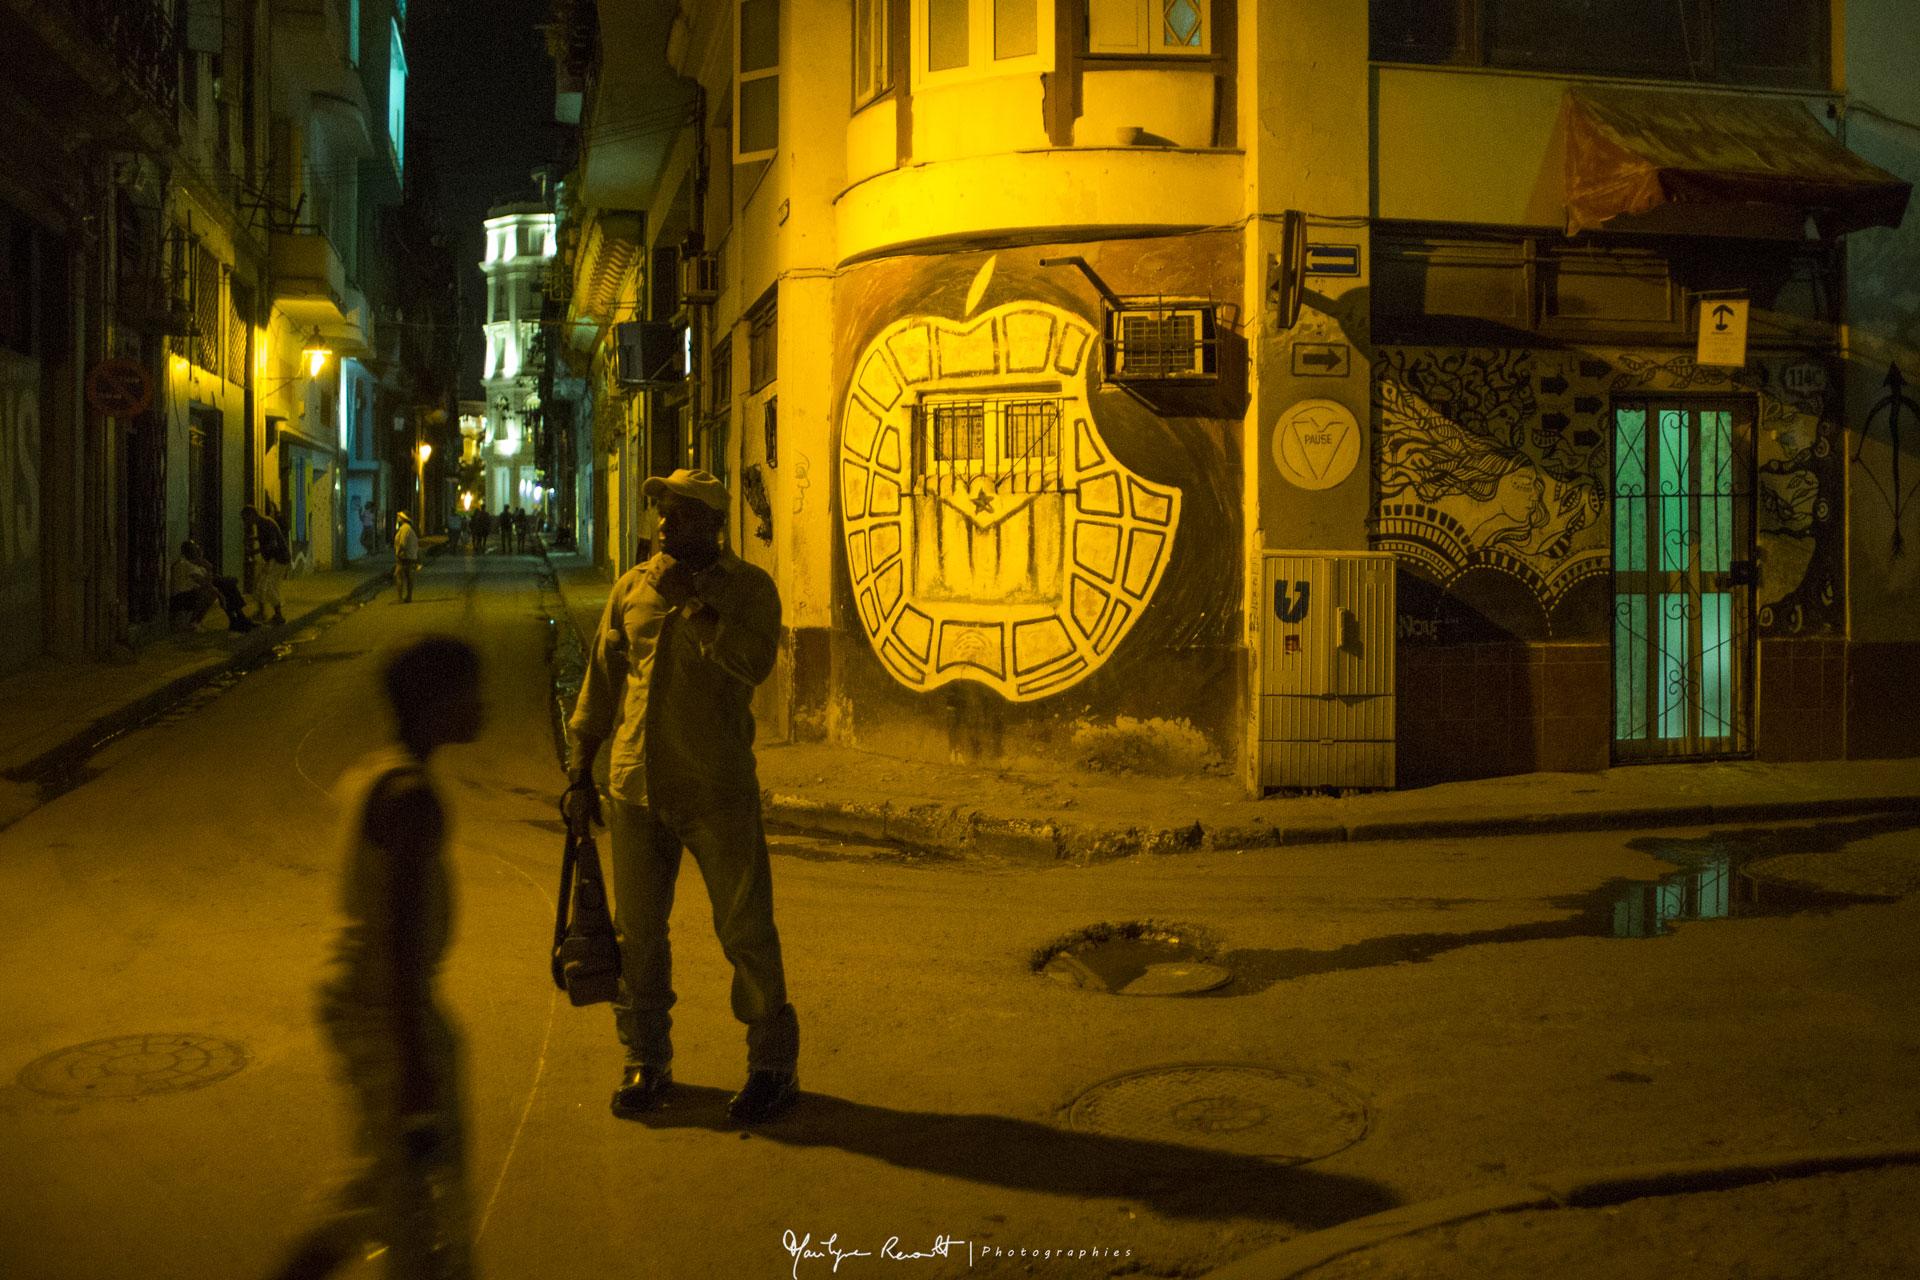 09-Cuba-marilyne renoult